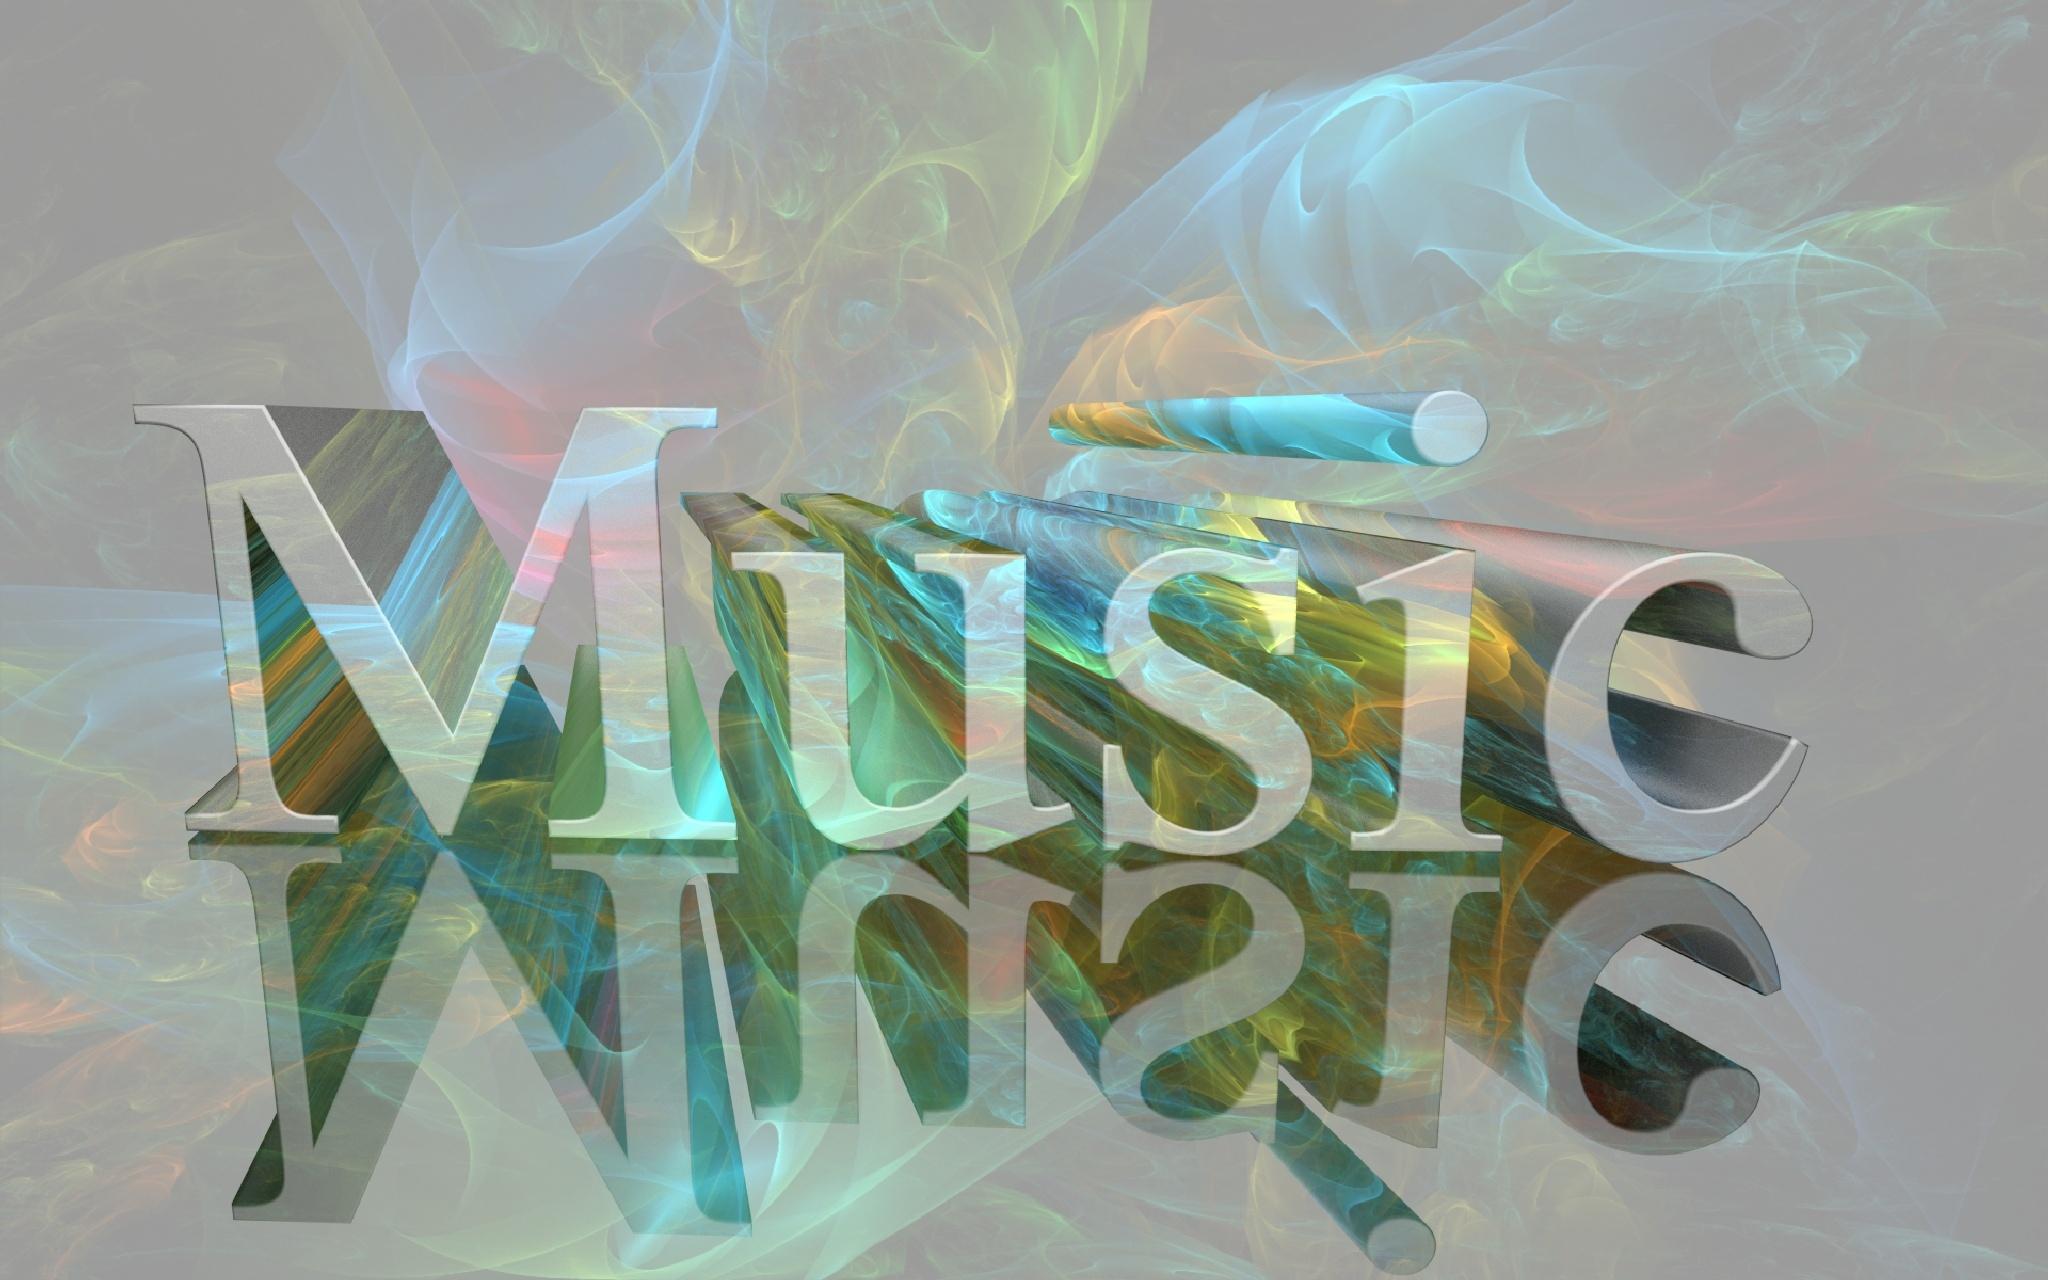 The Love of Music by Joe-Maccer